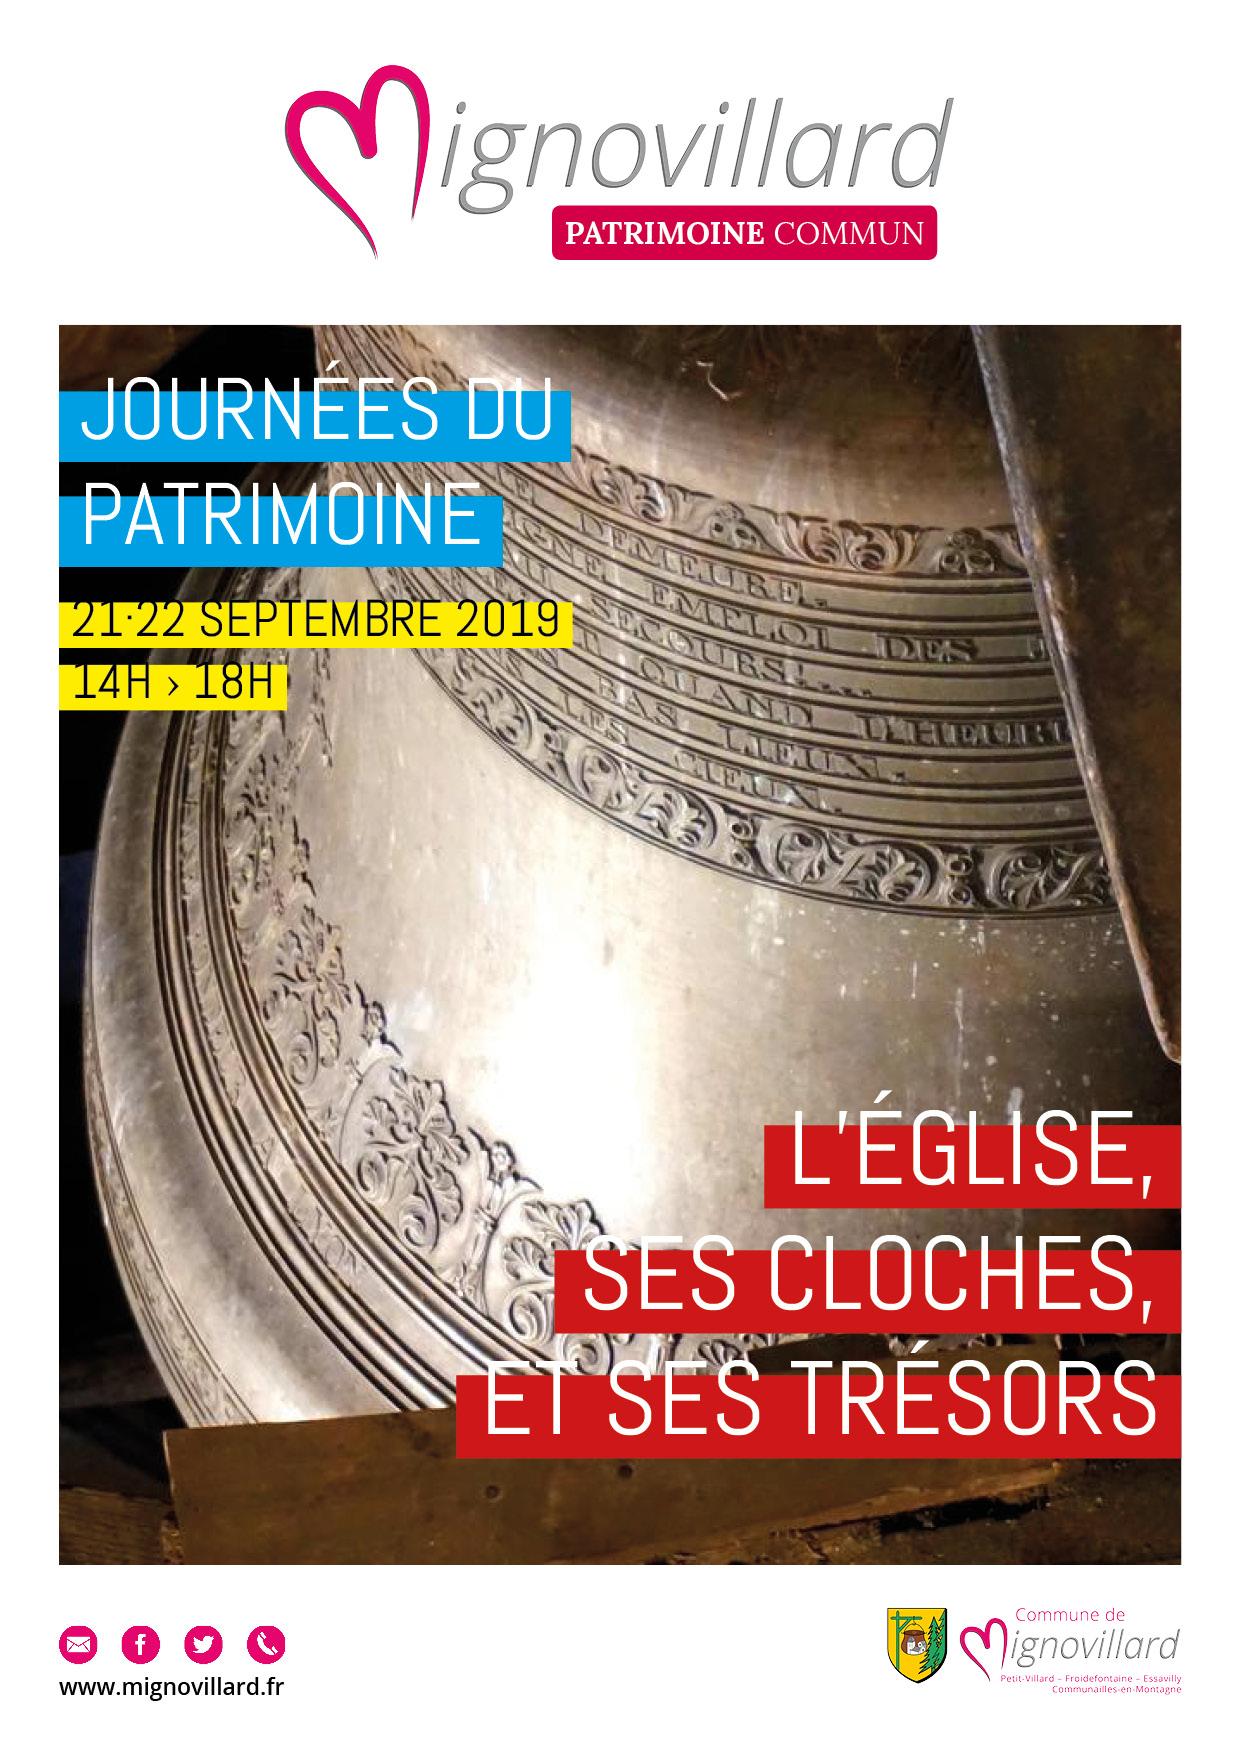 2019 Journee Patrimoineaffiche